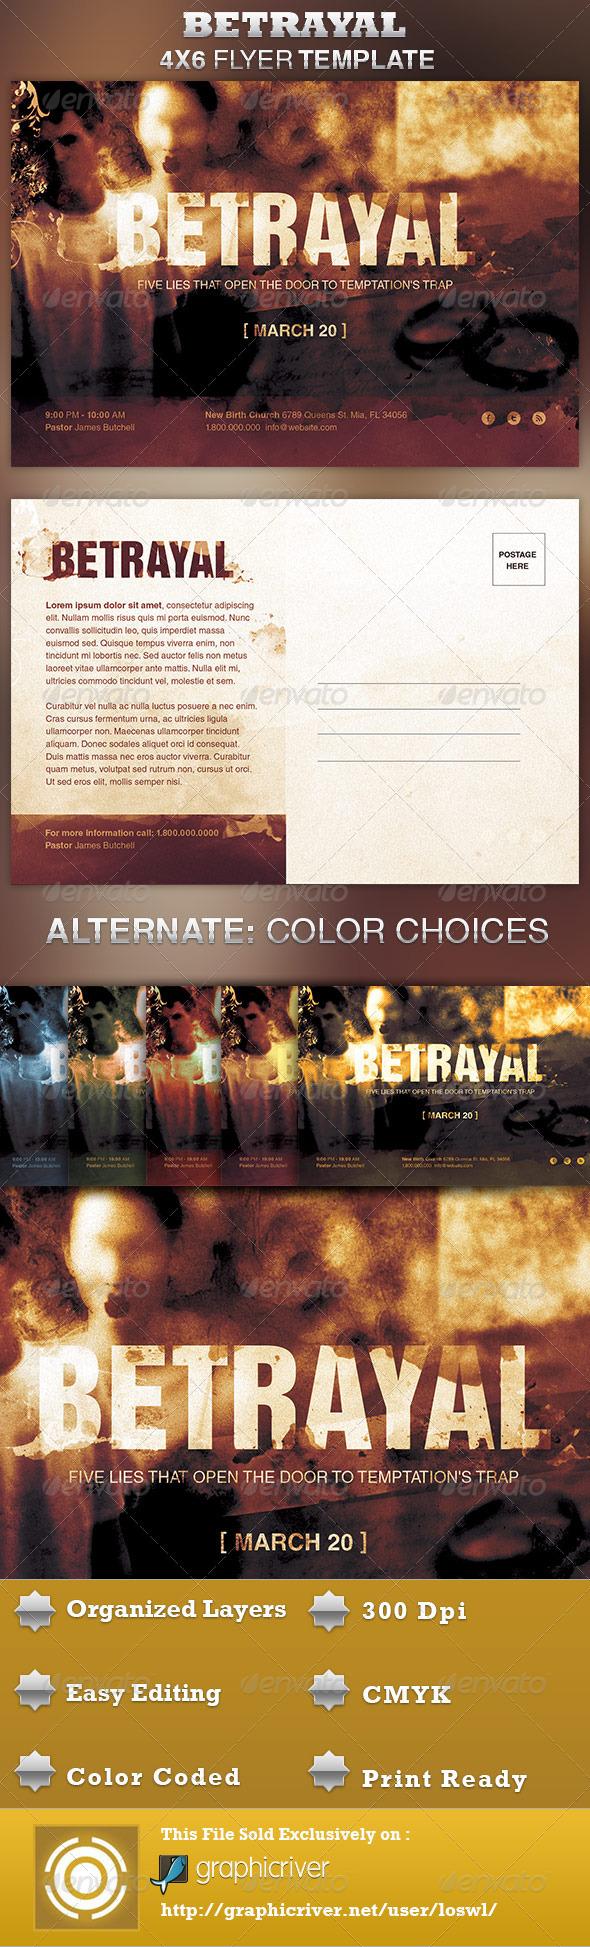 Betrayal Church Flyer Template - Church Flyers